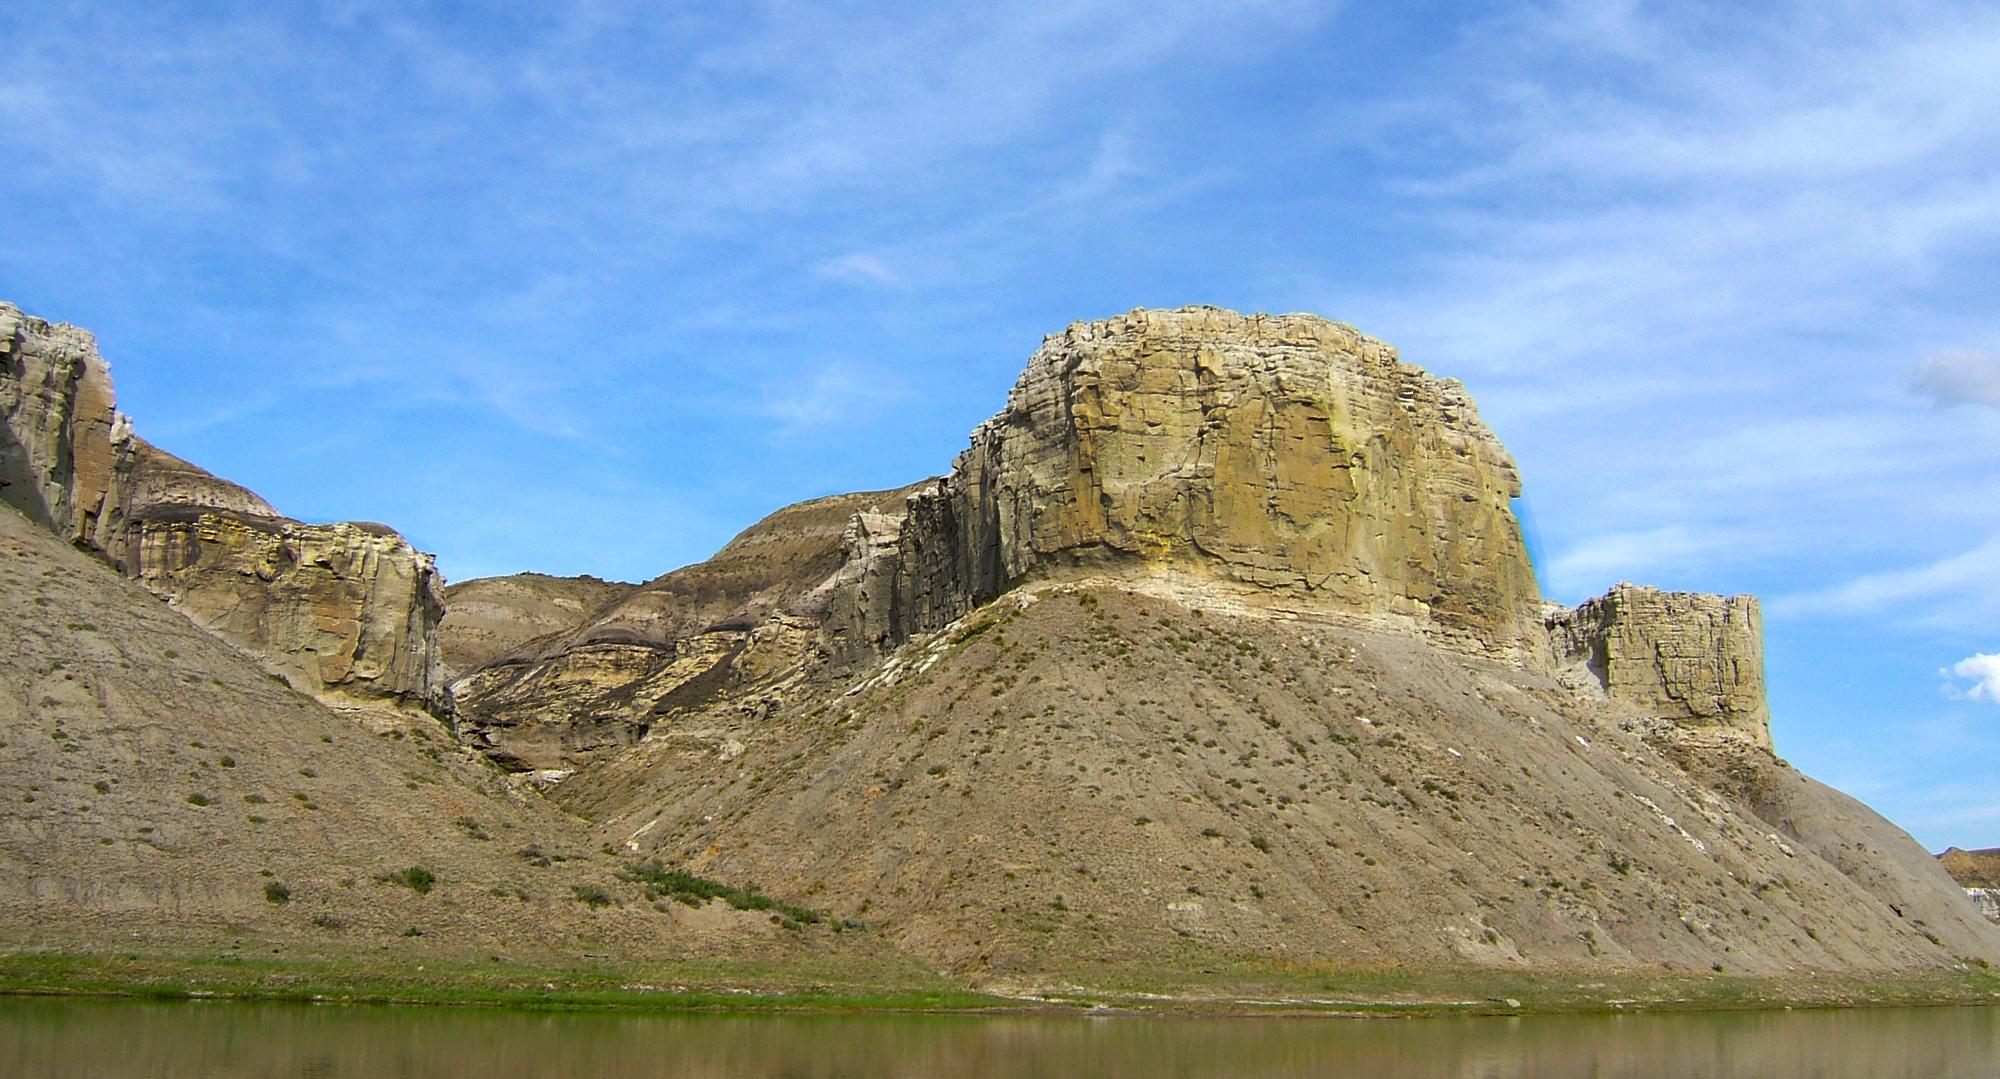 White Cliffs Missouri River Boating Adventure